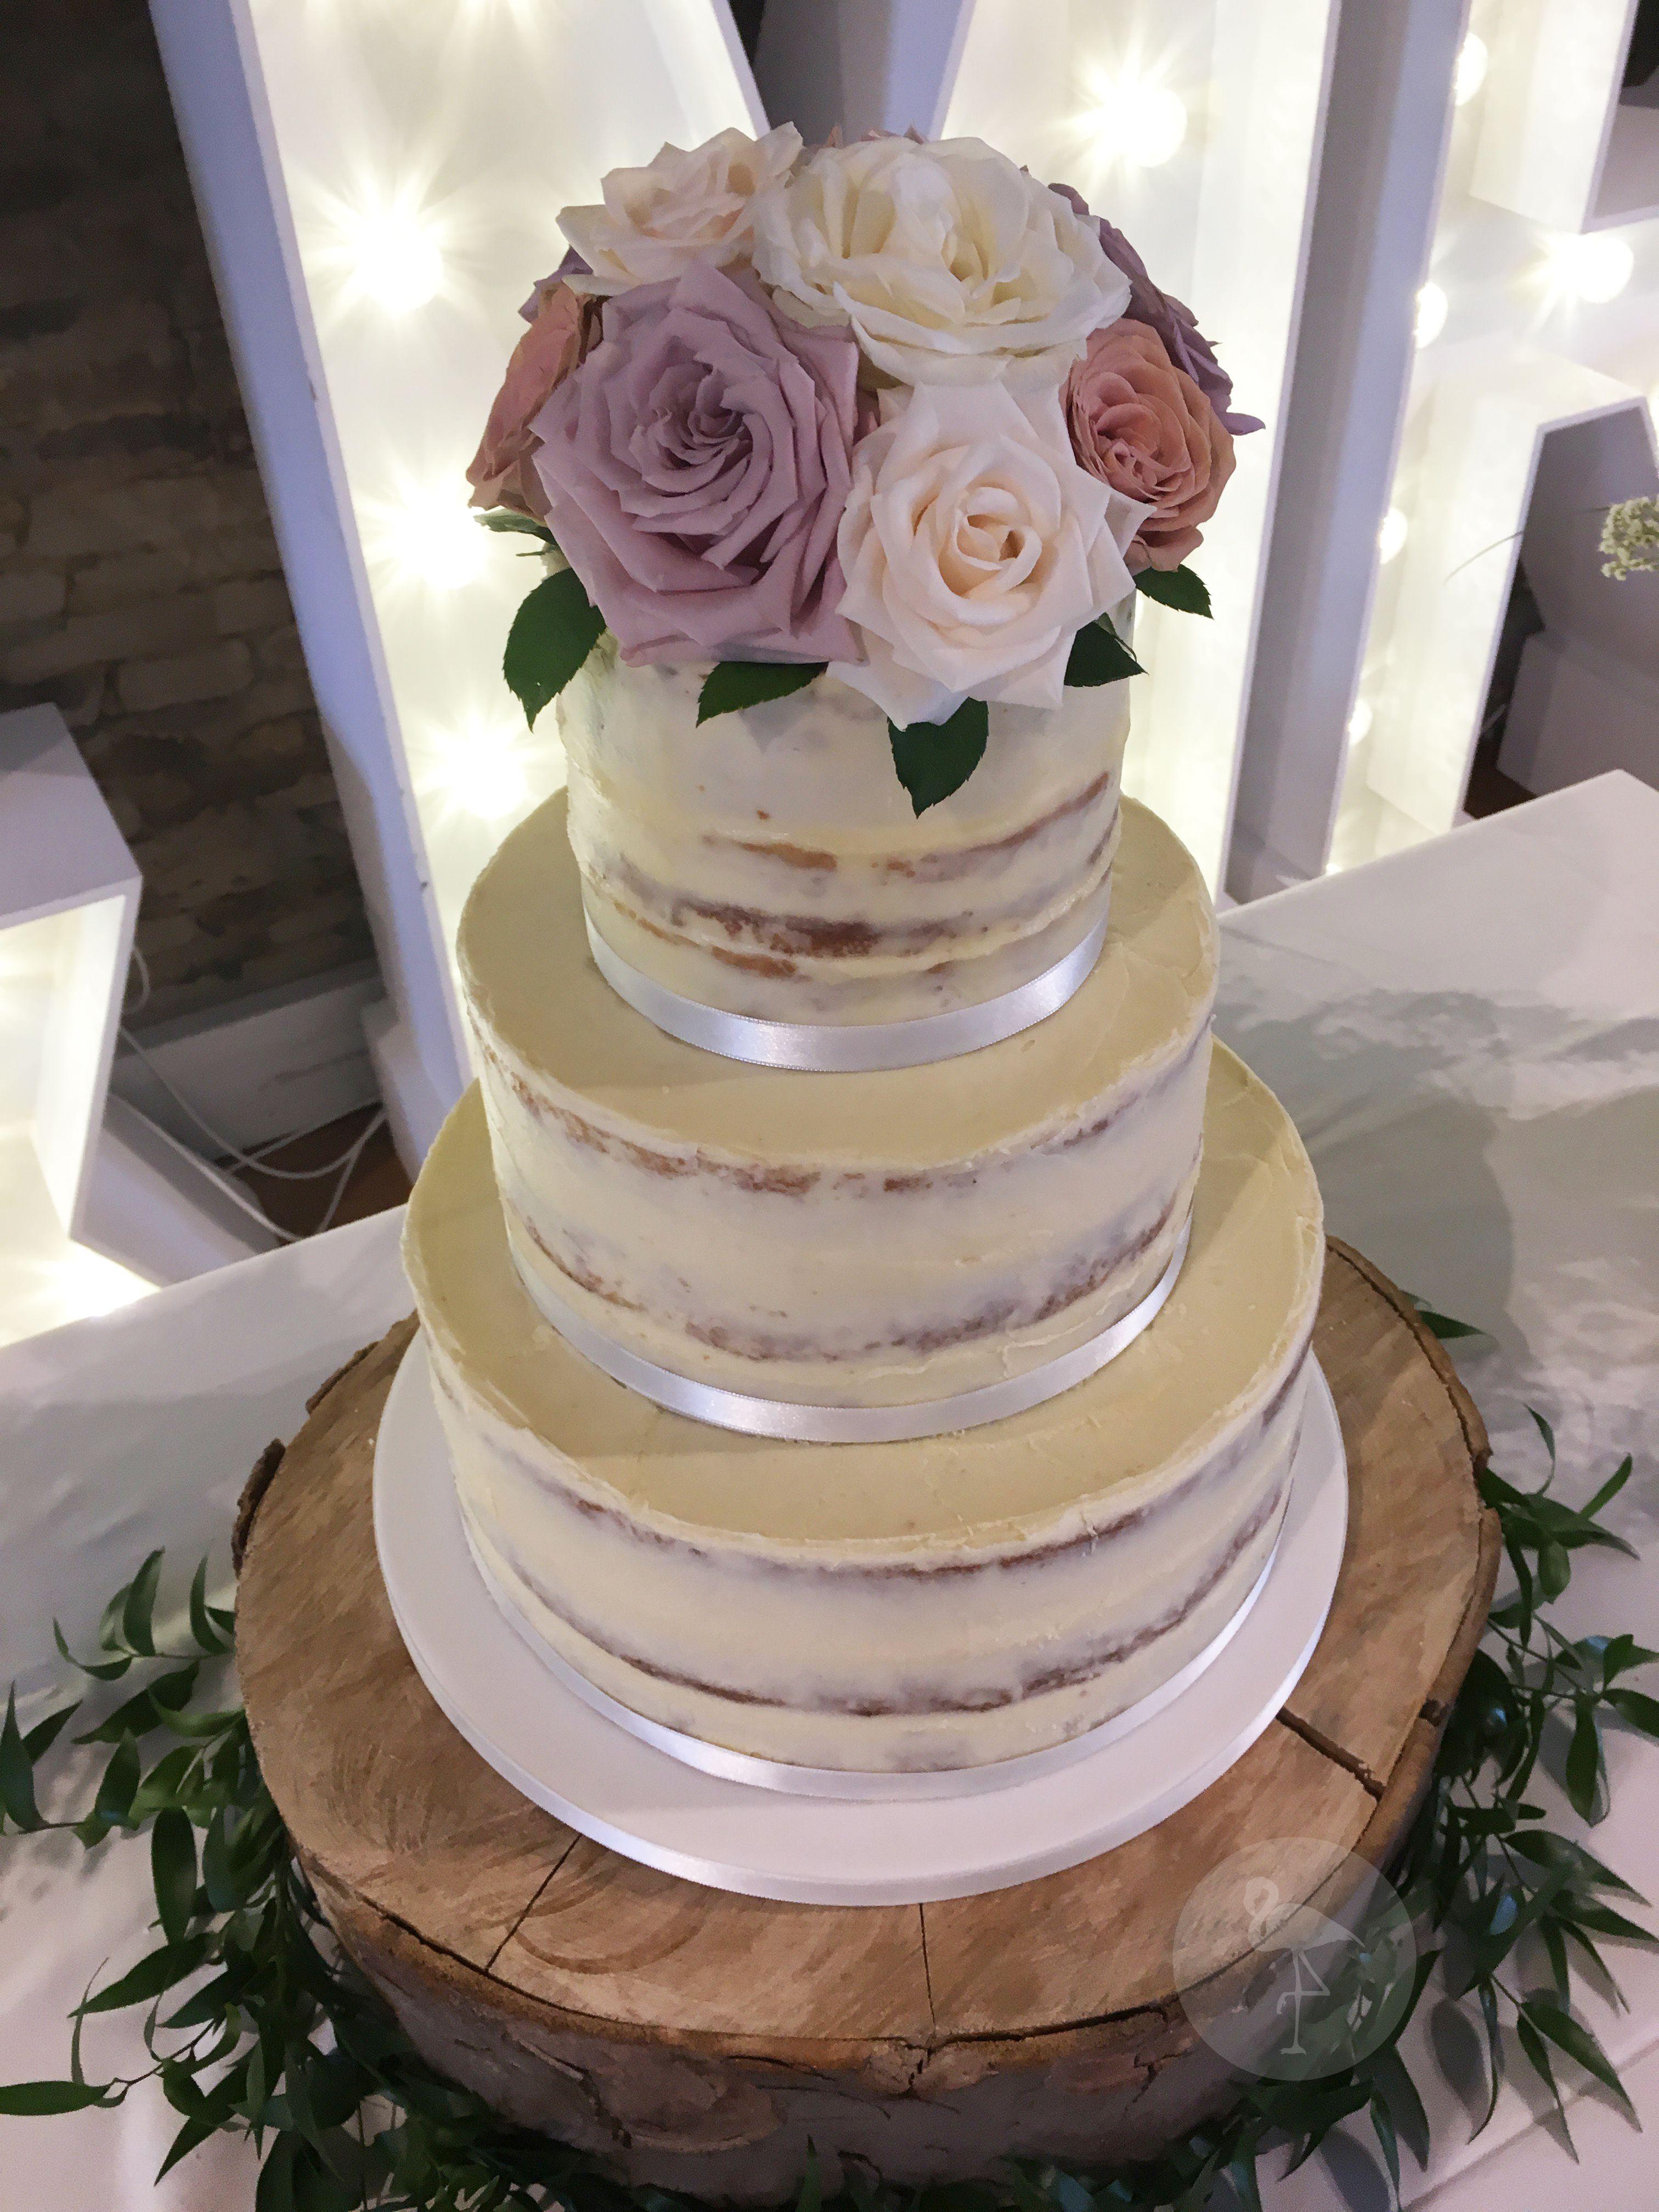 Rustic Semi Naked Wedding Cake with fresh flowersRustic Semi Naked Wedding Cake with fresh flowers   Our Wedding  . Fresh Flower Wedding Cakes. Home Design Ideas